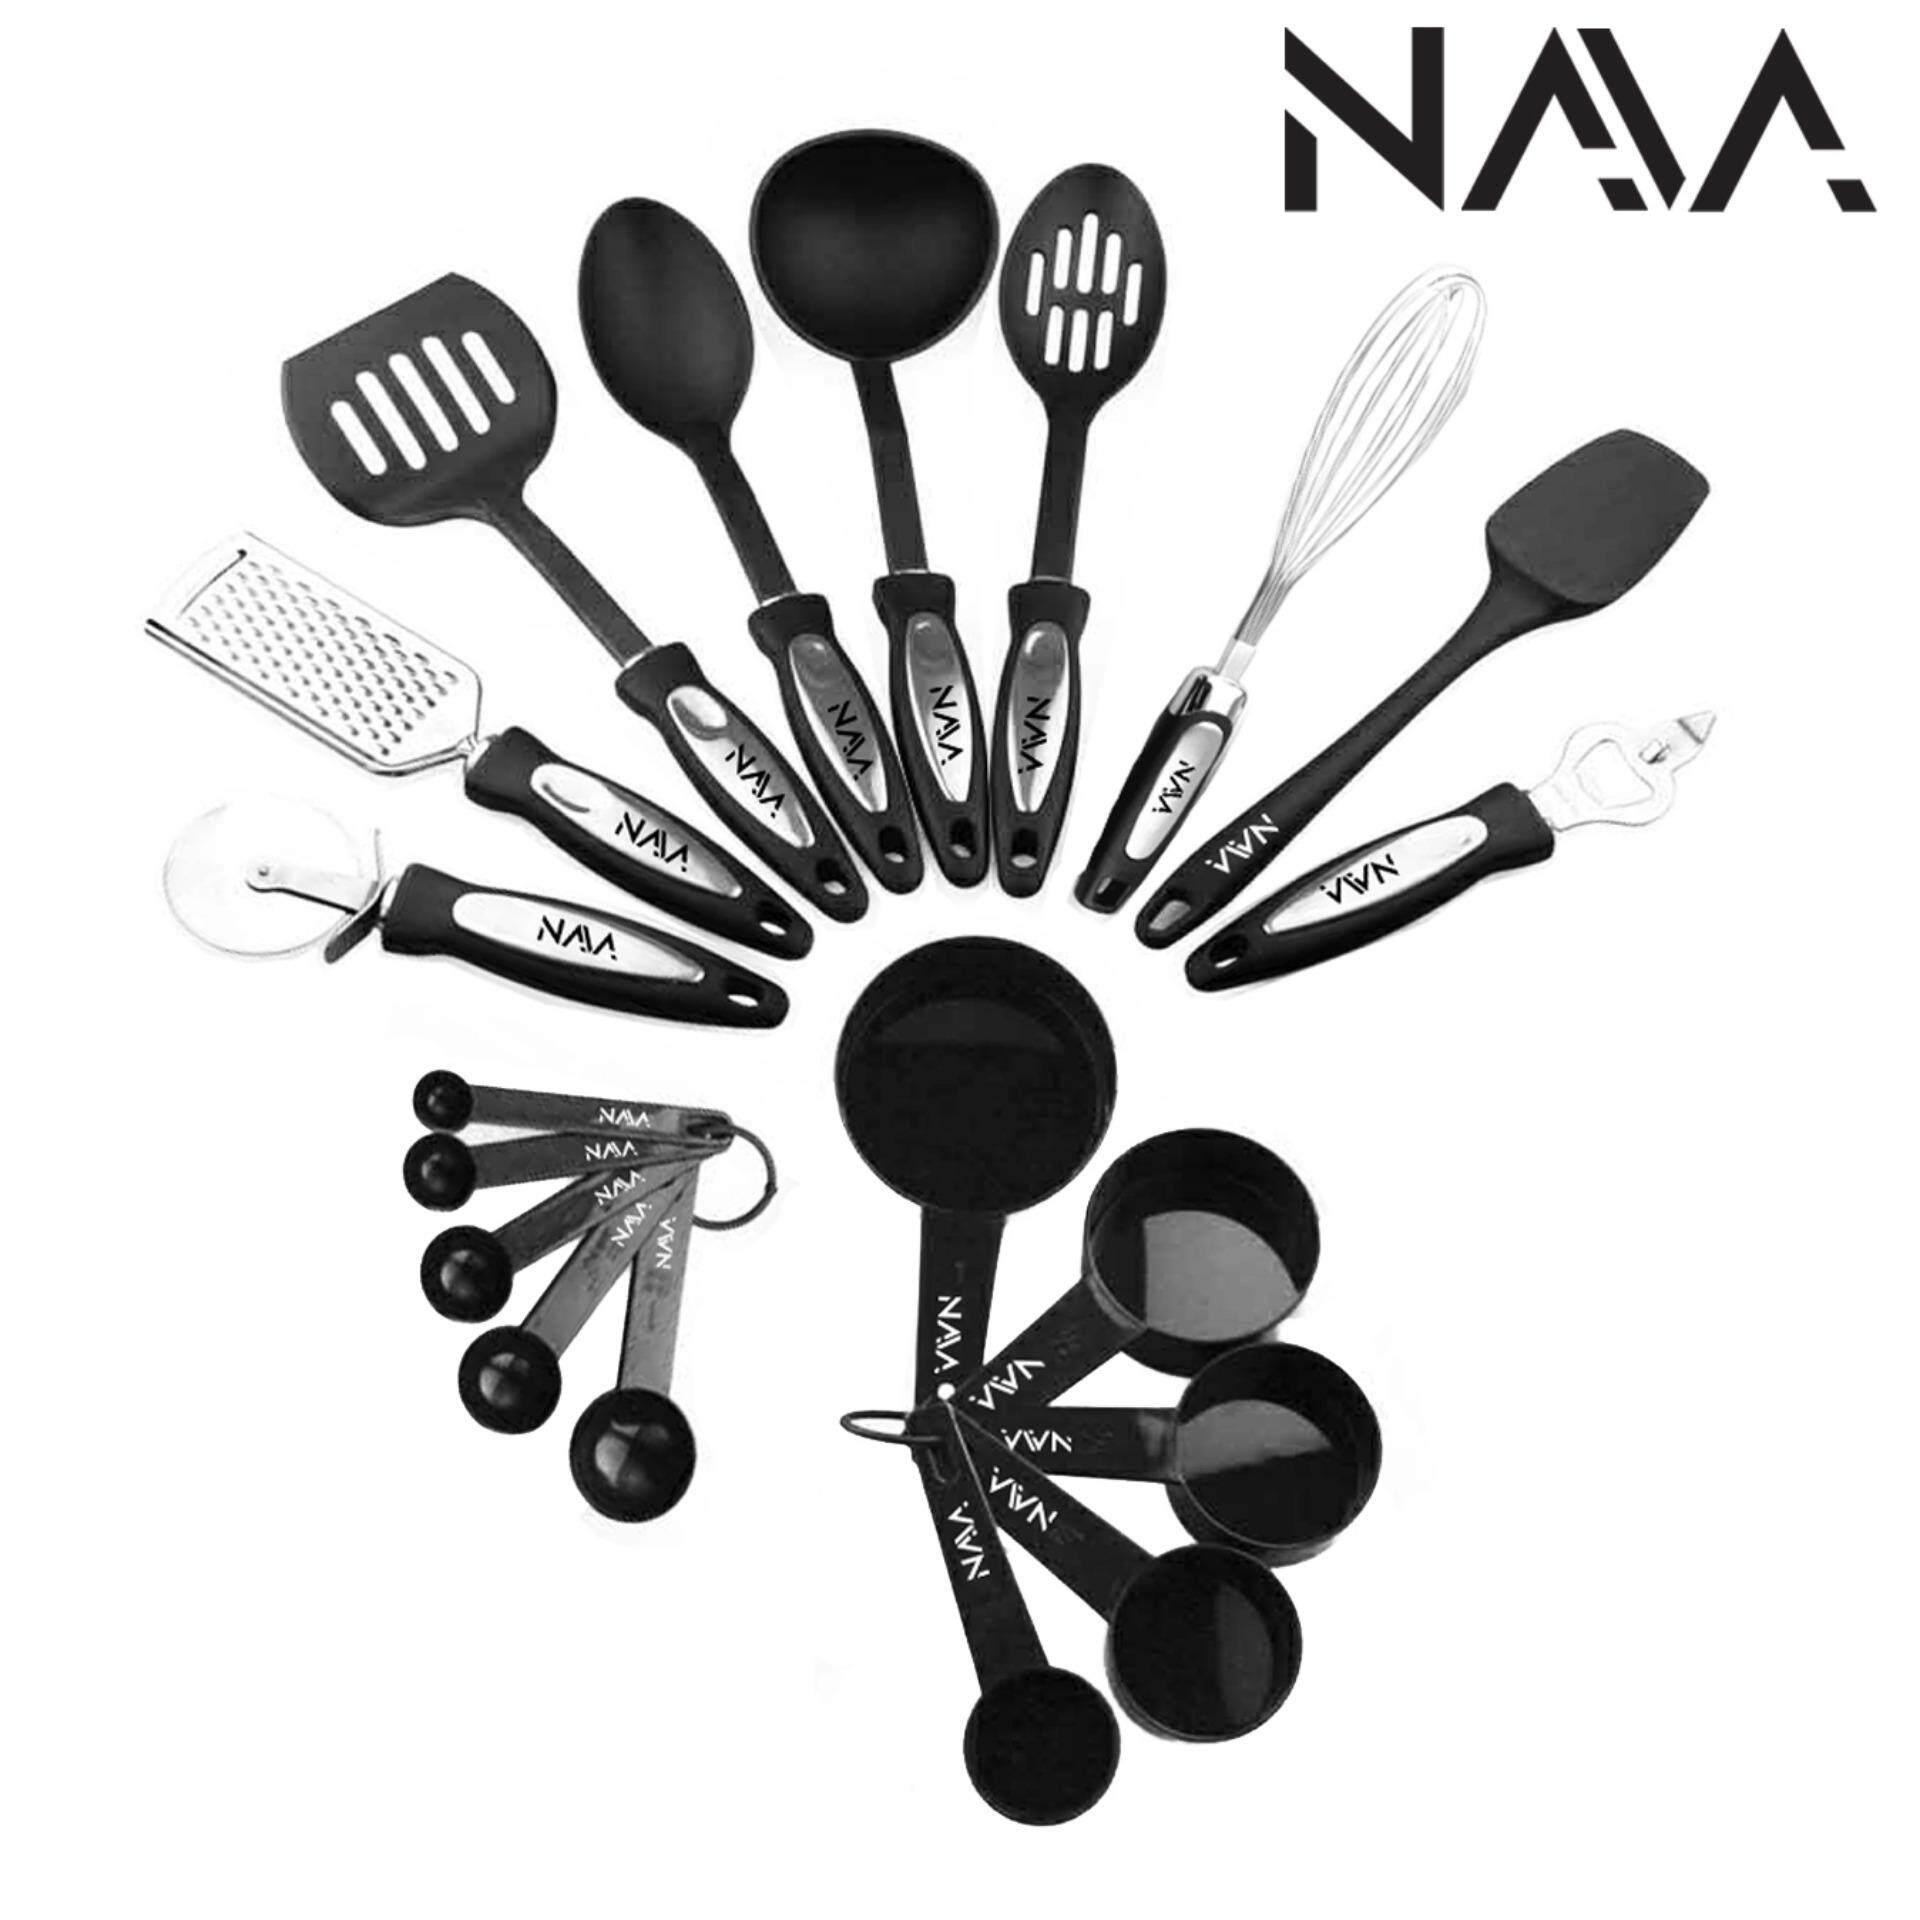 NaVa 19 PCS Tip Top Kitchen Cooking Ladle Tools And Gadget Full Set |  Lazada Malaysia